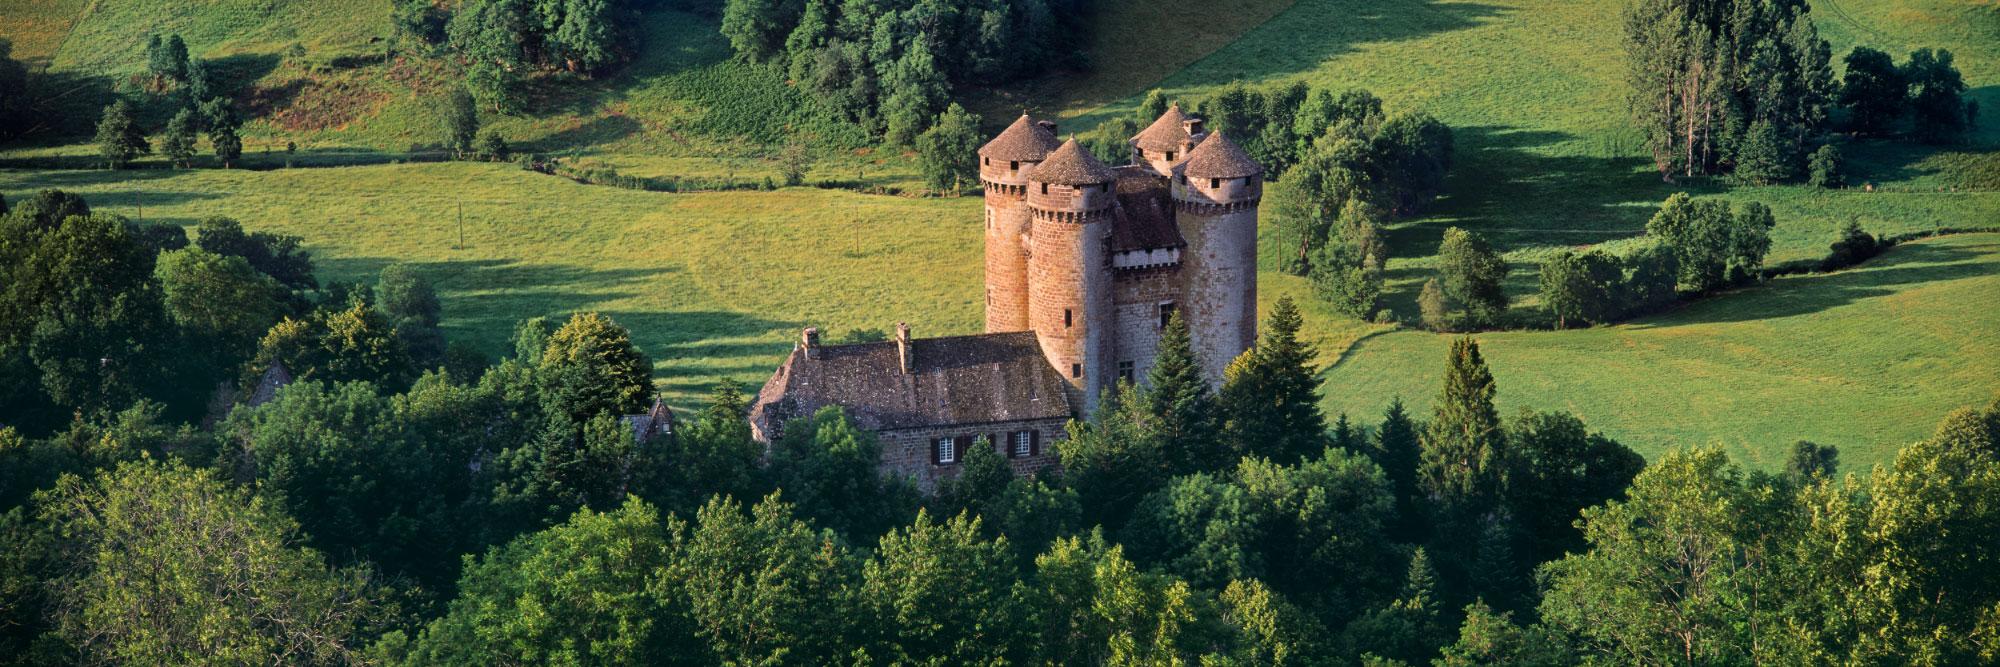 Château d'Anjony, Tournemire